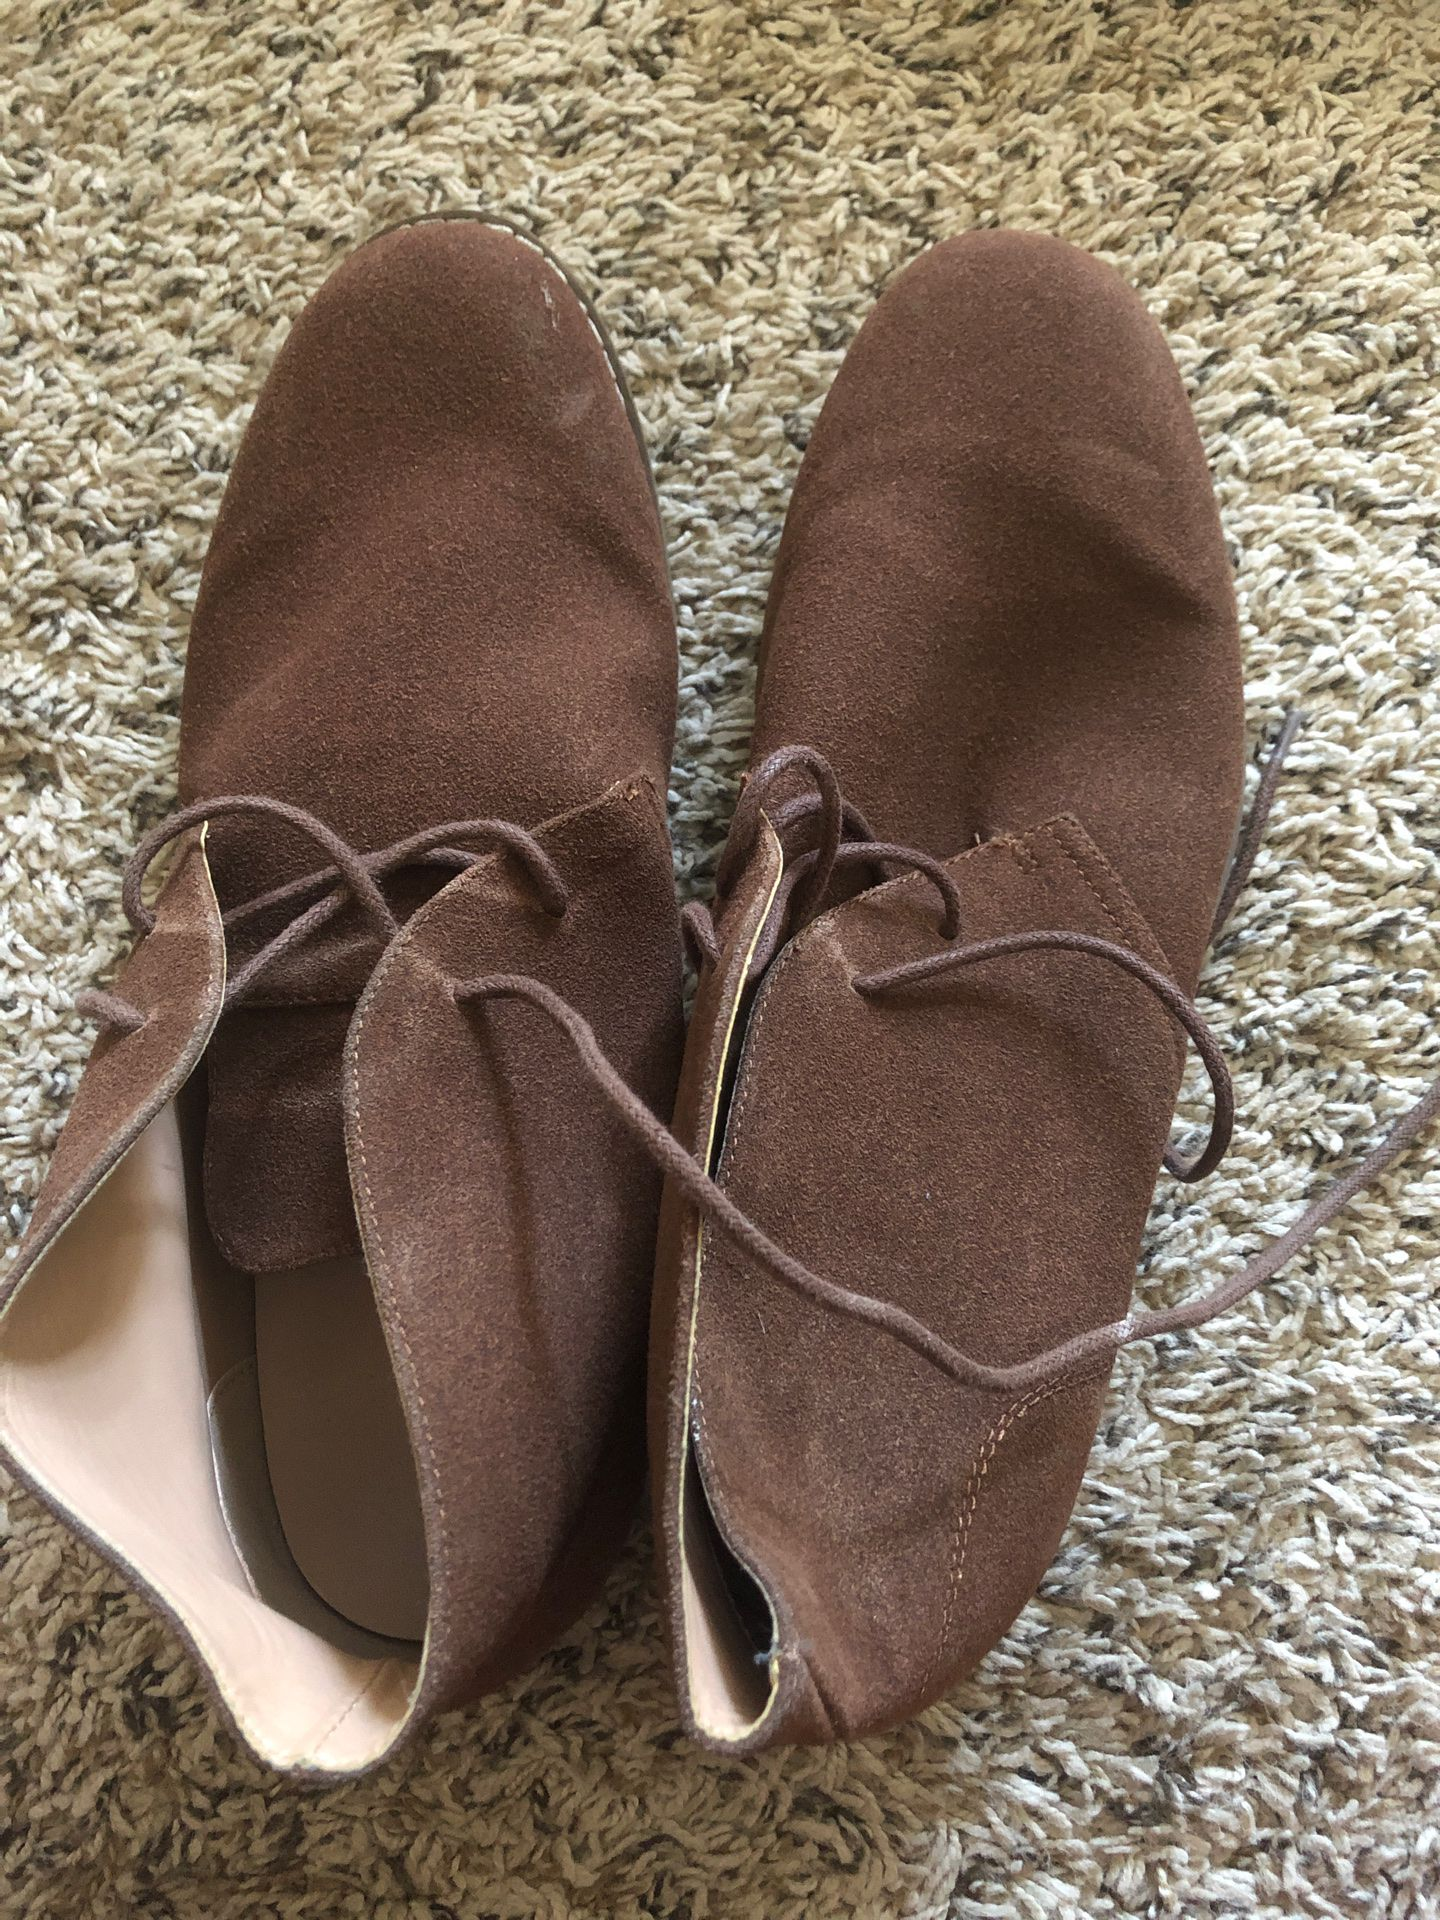 Men's 12size dessert boots